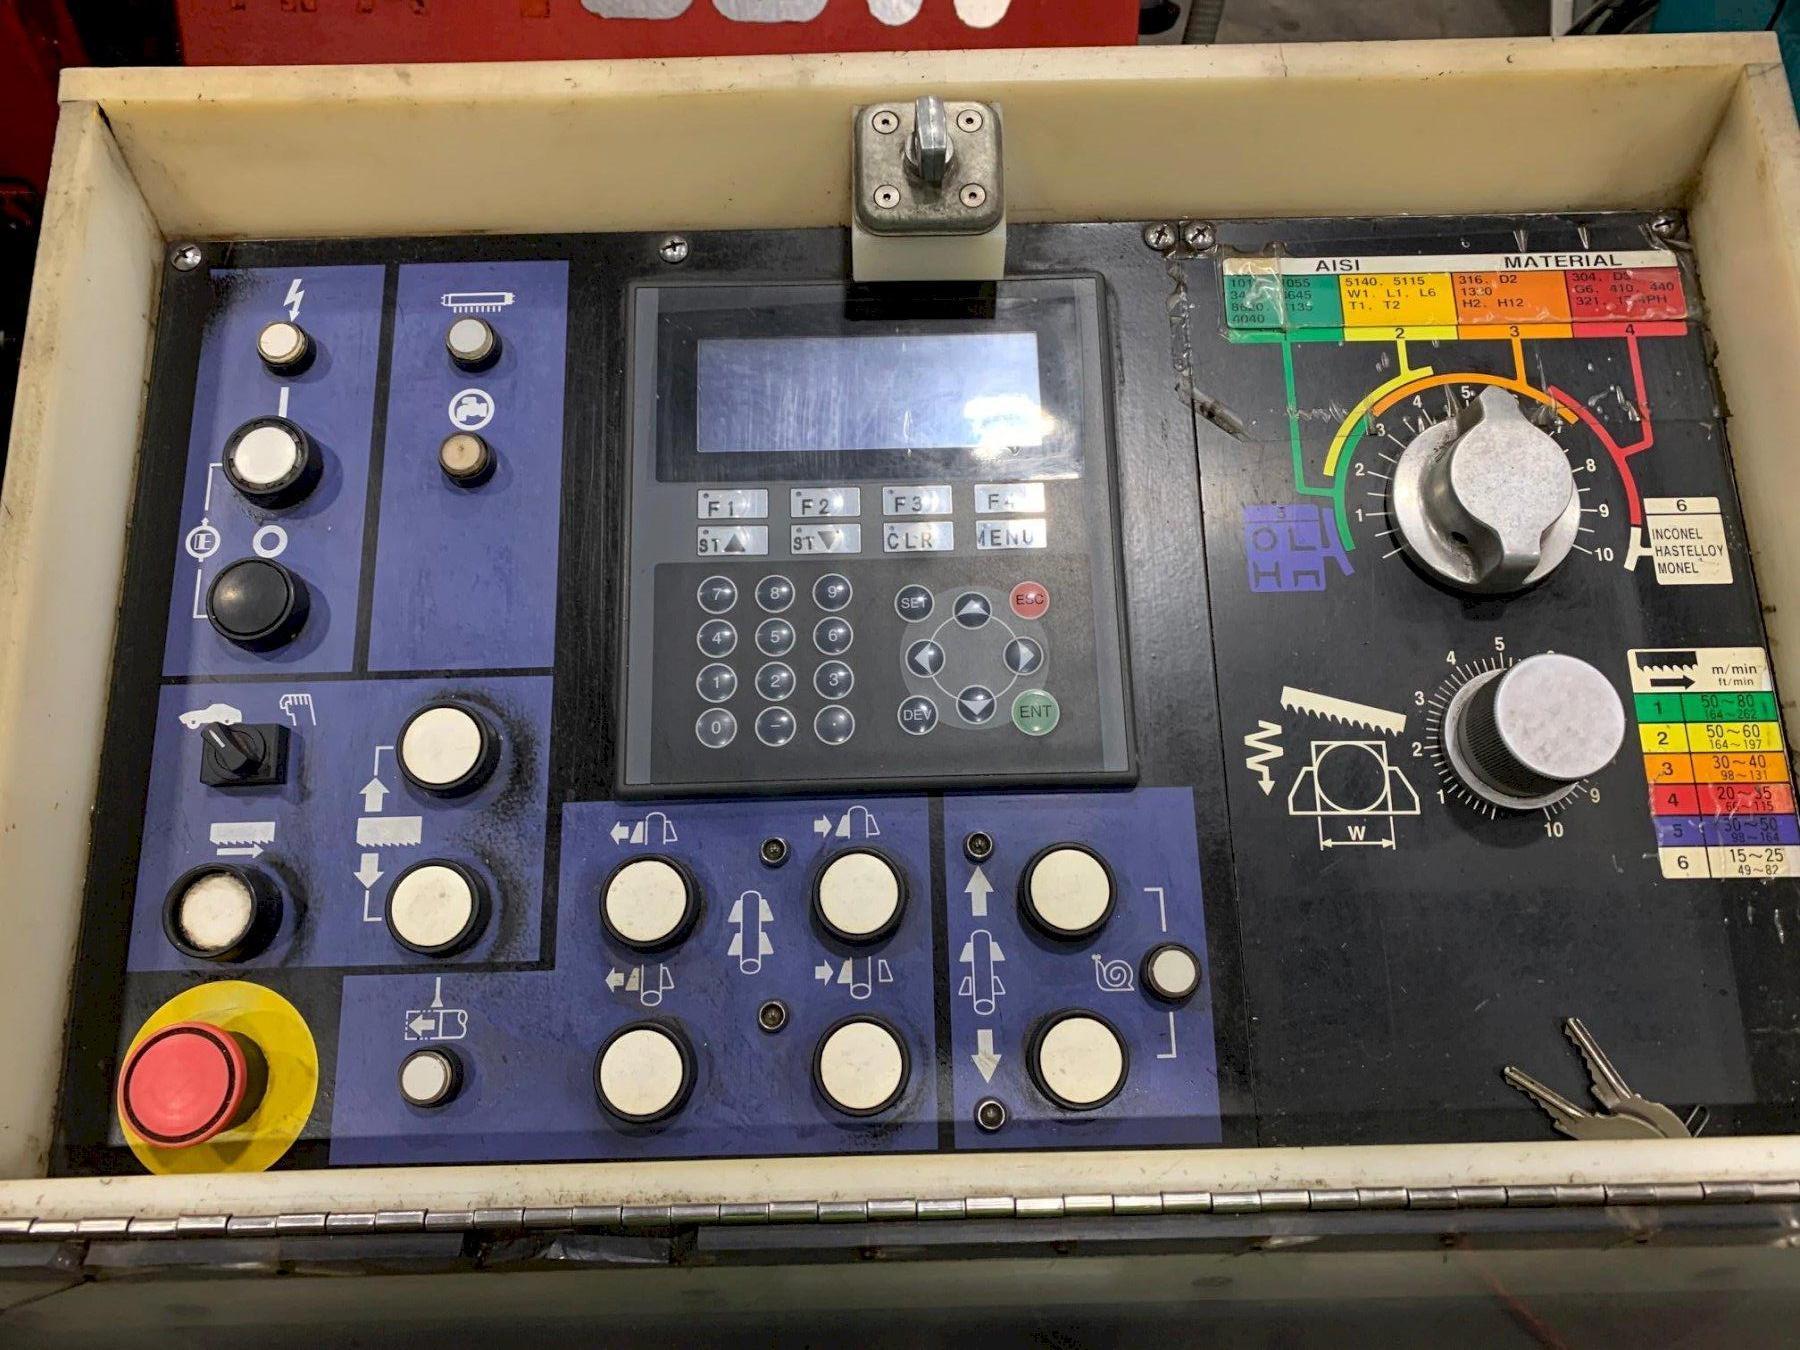 "USED AMADA MODEL HFA-400W 16"" X 16"" AUTOMATIC CNC HORIZONTAL BANDSAW, Stock # 10752, Year 2004"